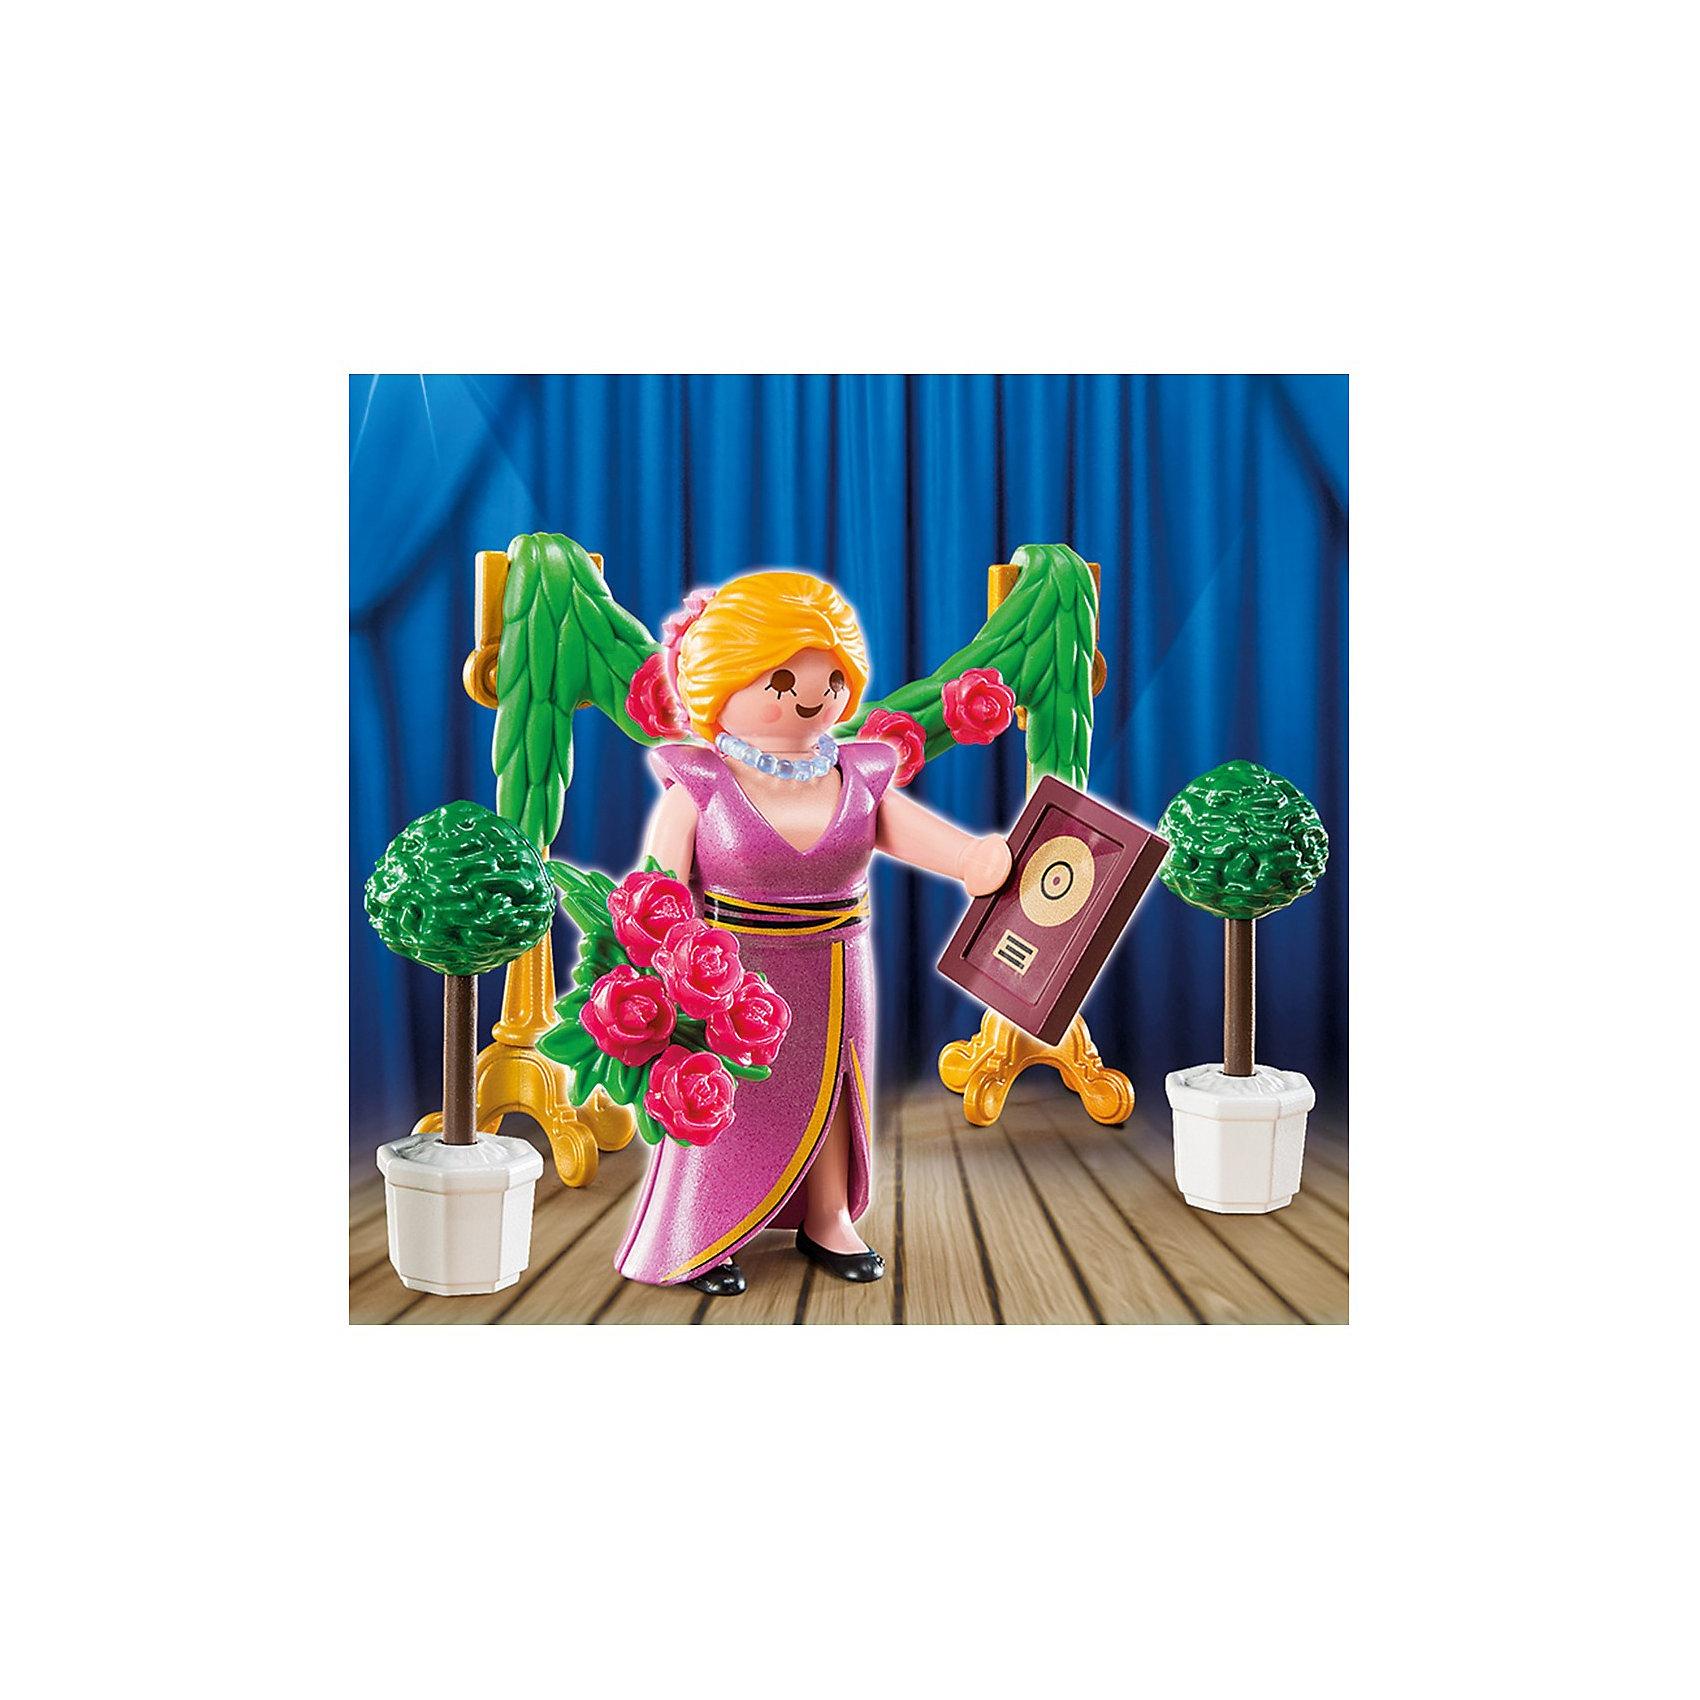 PLAYMOBIL® Экстра-набор: Знаменитость с наградой, PLAYMOBIL playmobil® экстра набор фея с оленем playmobil